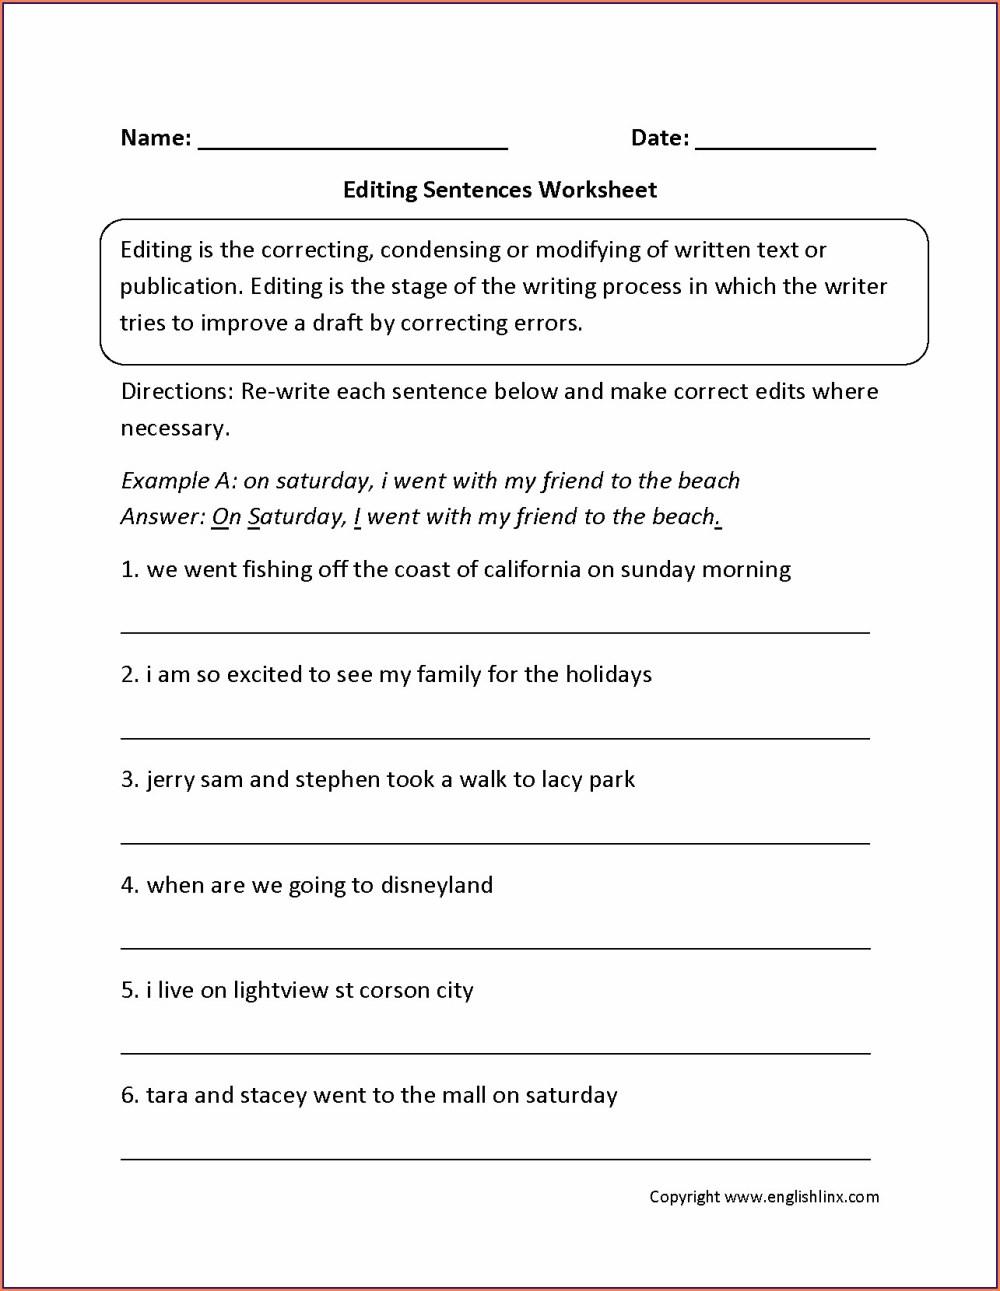 medium resolution of Diagramming Sentences Worksheet 3rd Grade   Printable Worksheets and  Activities for Teachers